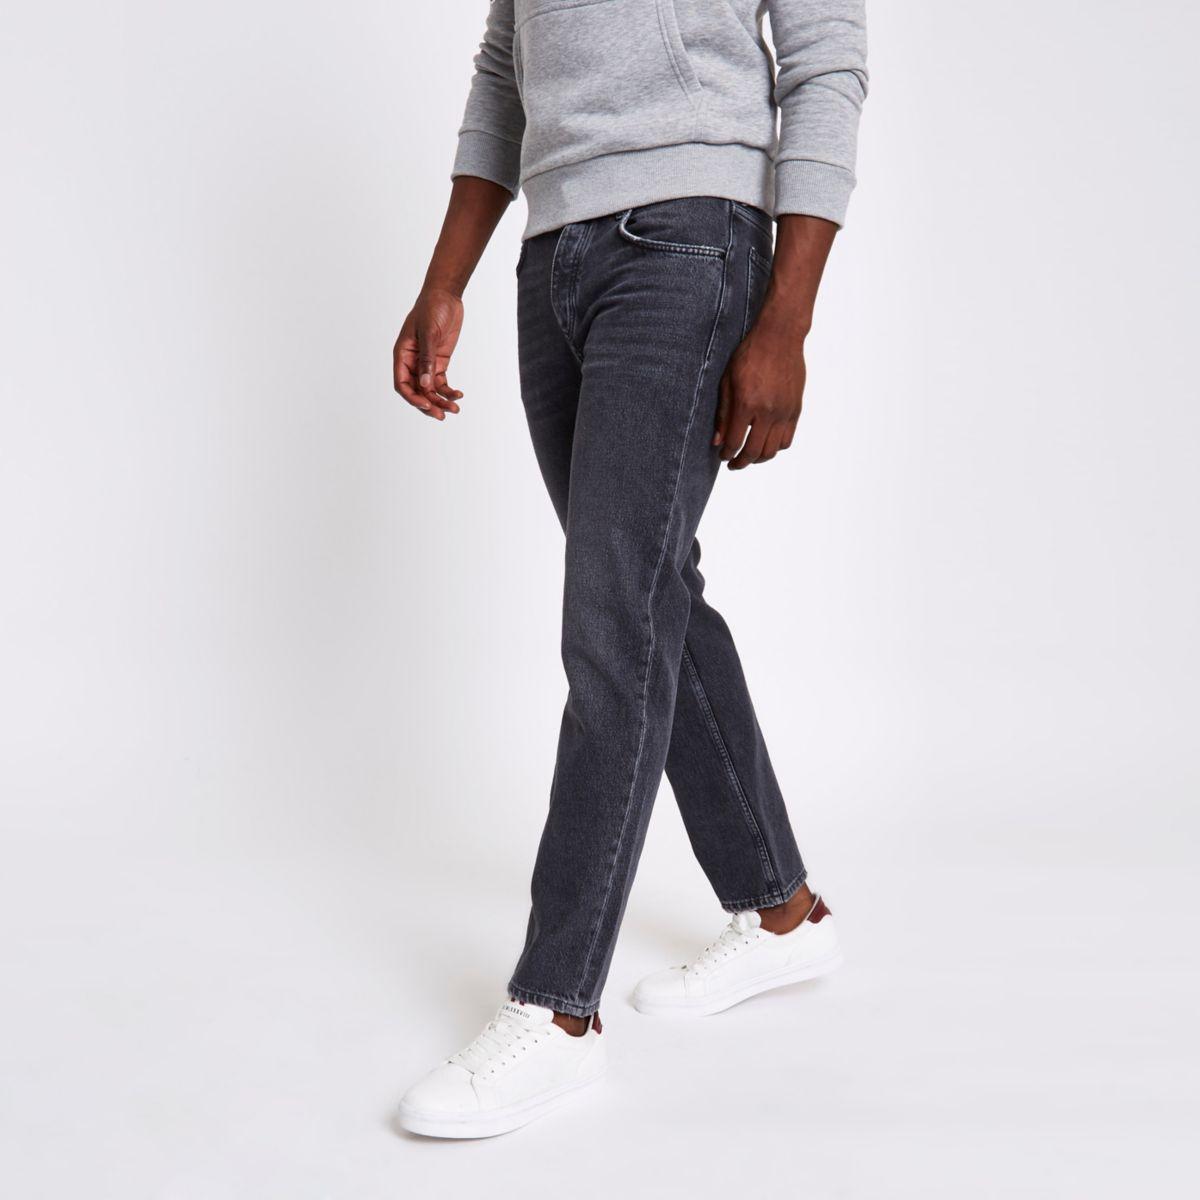 Grey Bobby standard jeans